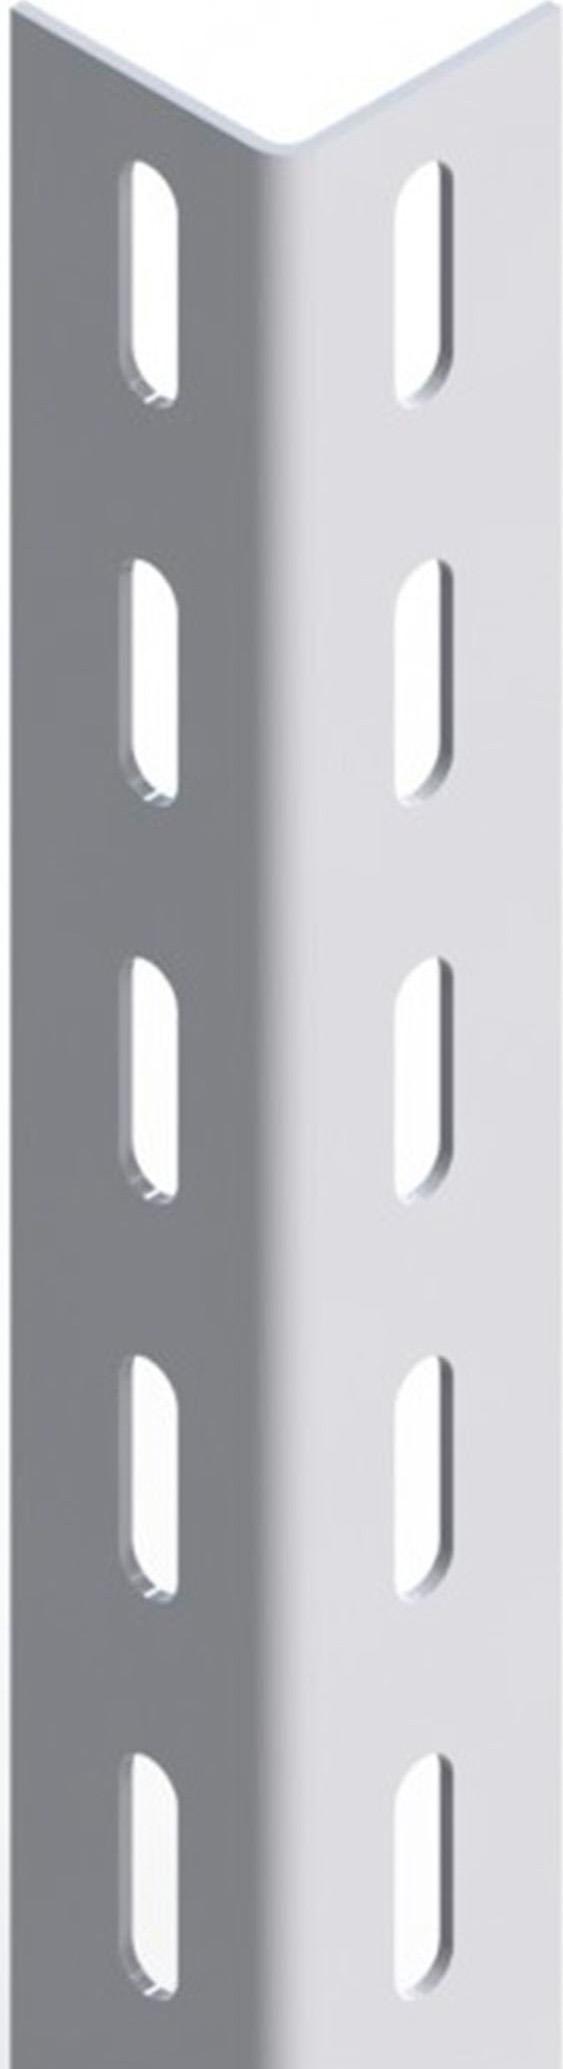 Bondi Angolare per Scaffali Scaffalature 40x40 Asole Ovali 250 cm Linea Basic